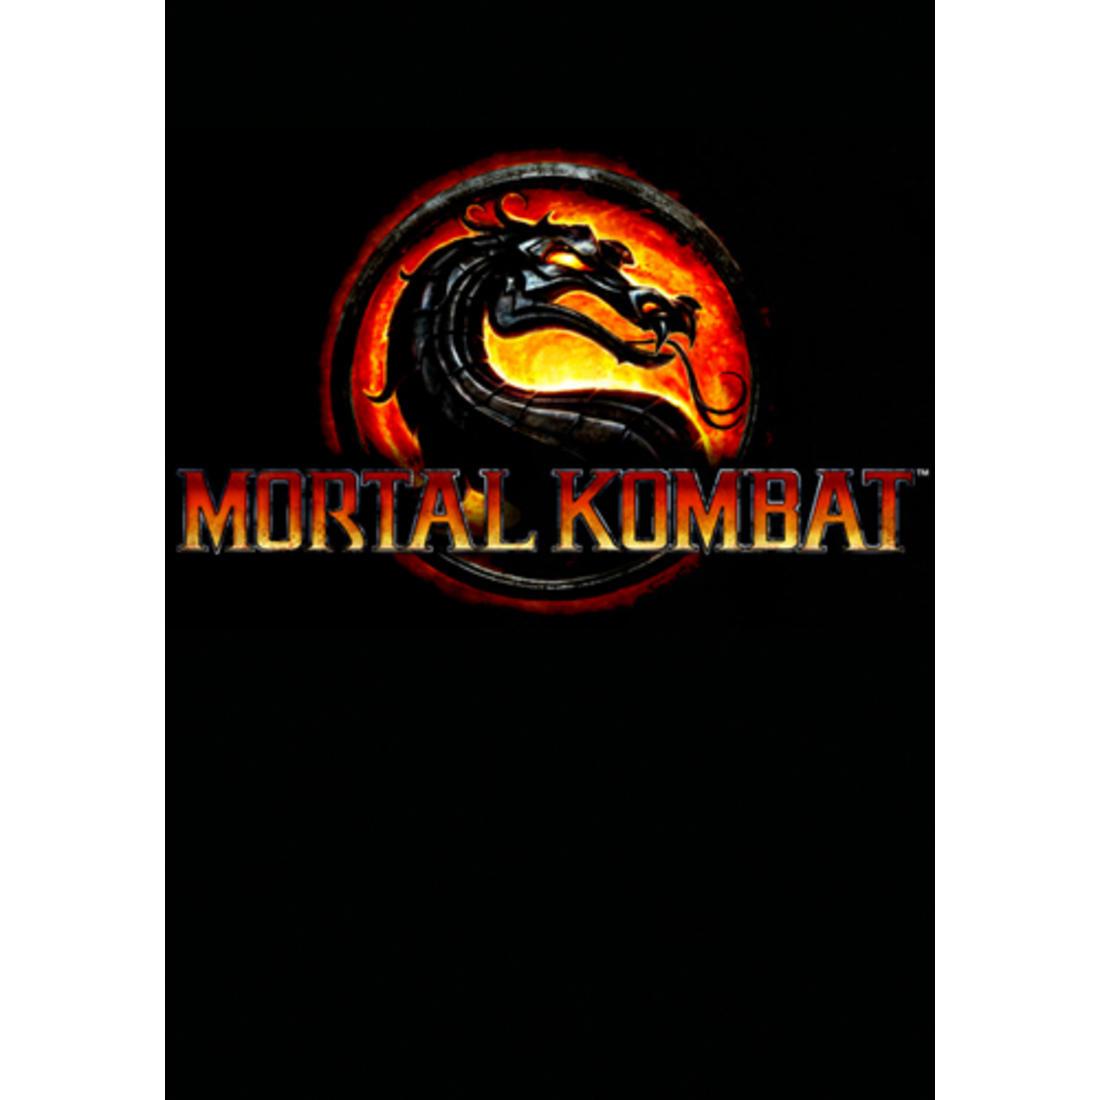 MORTAL KOMBAT Logo T.